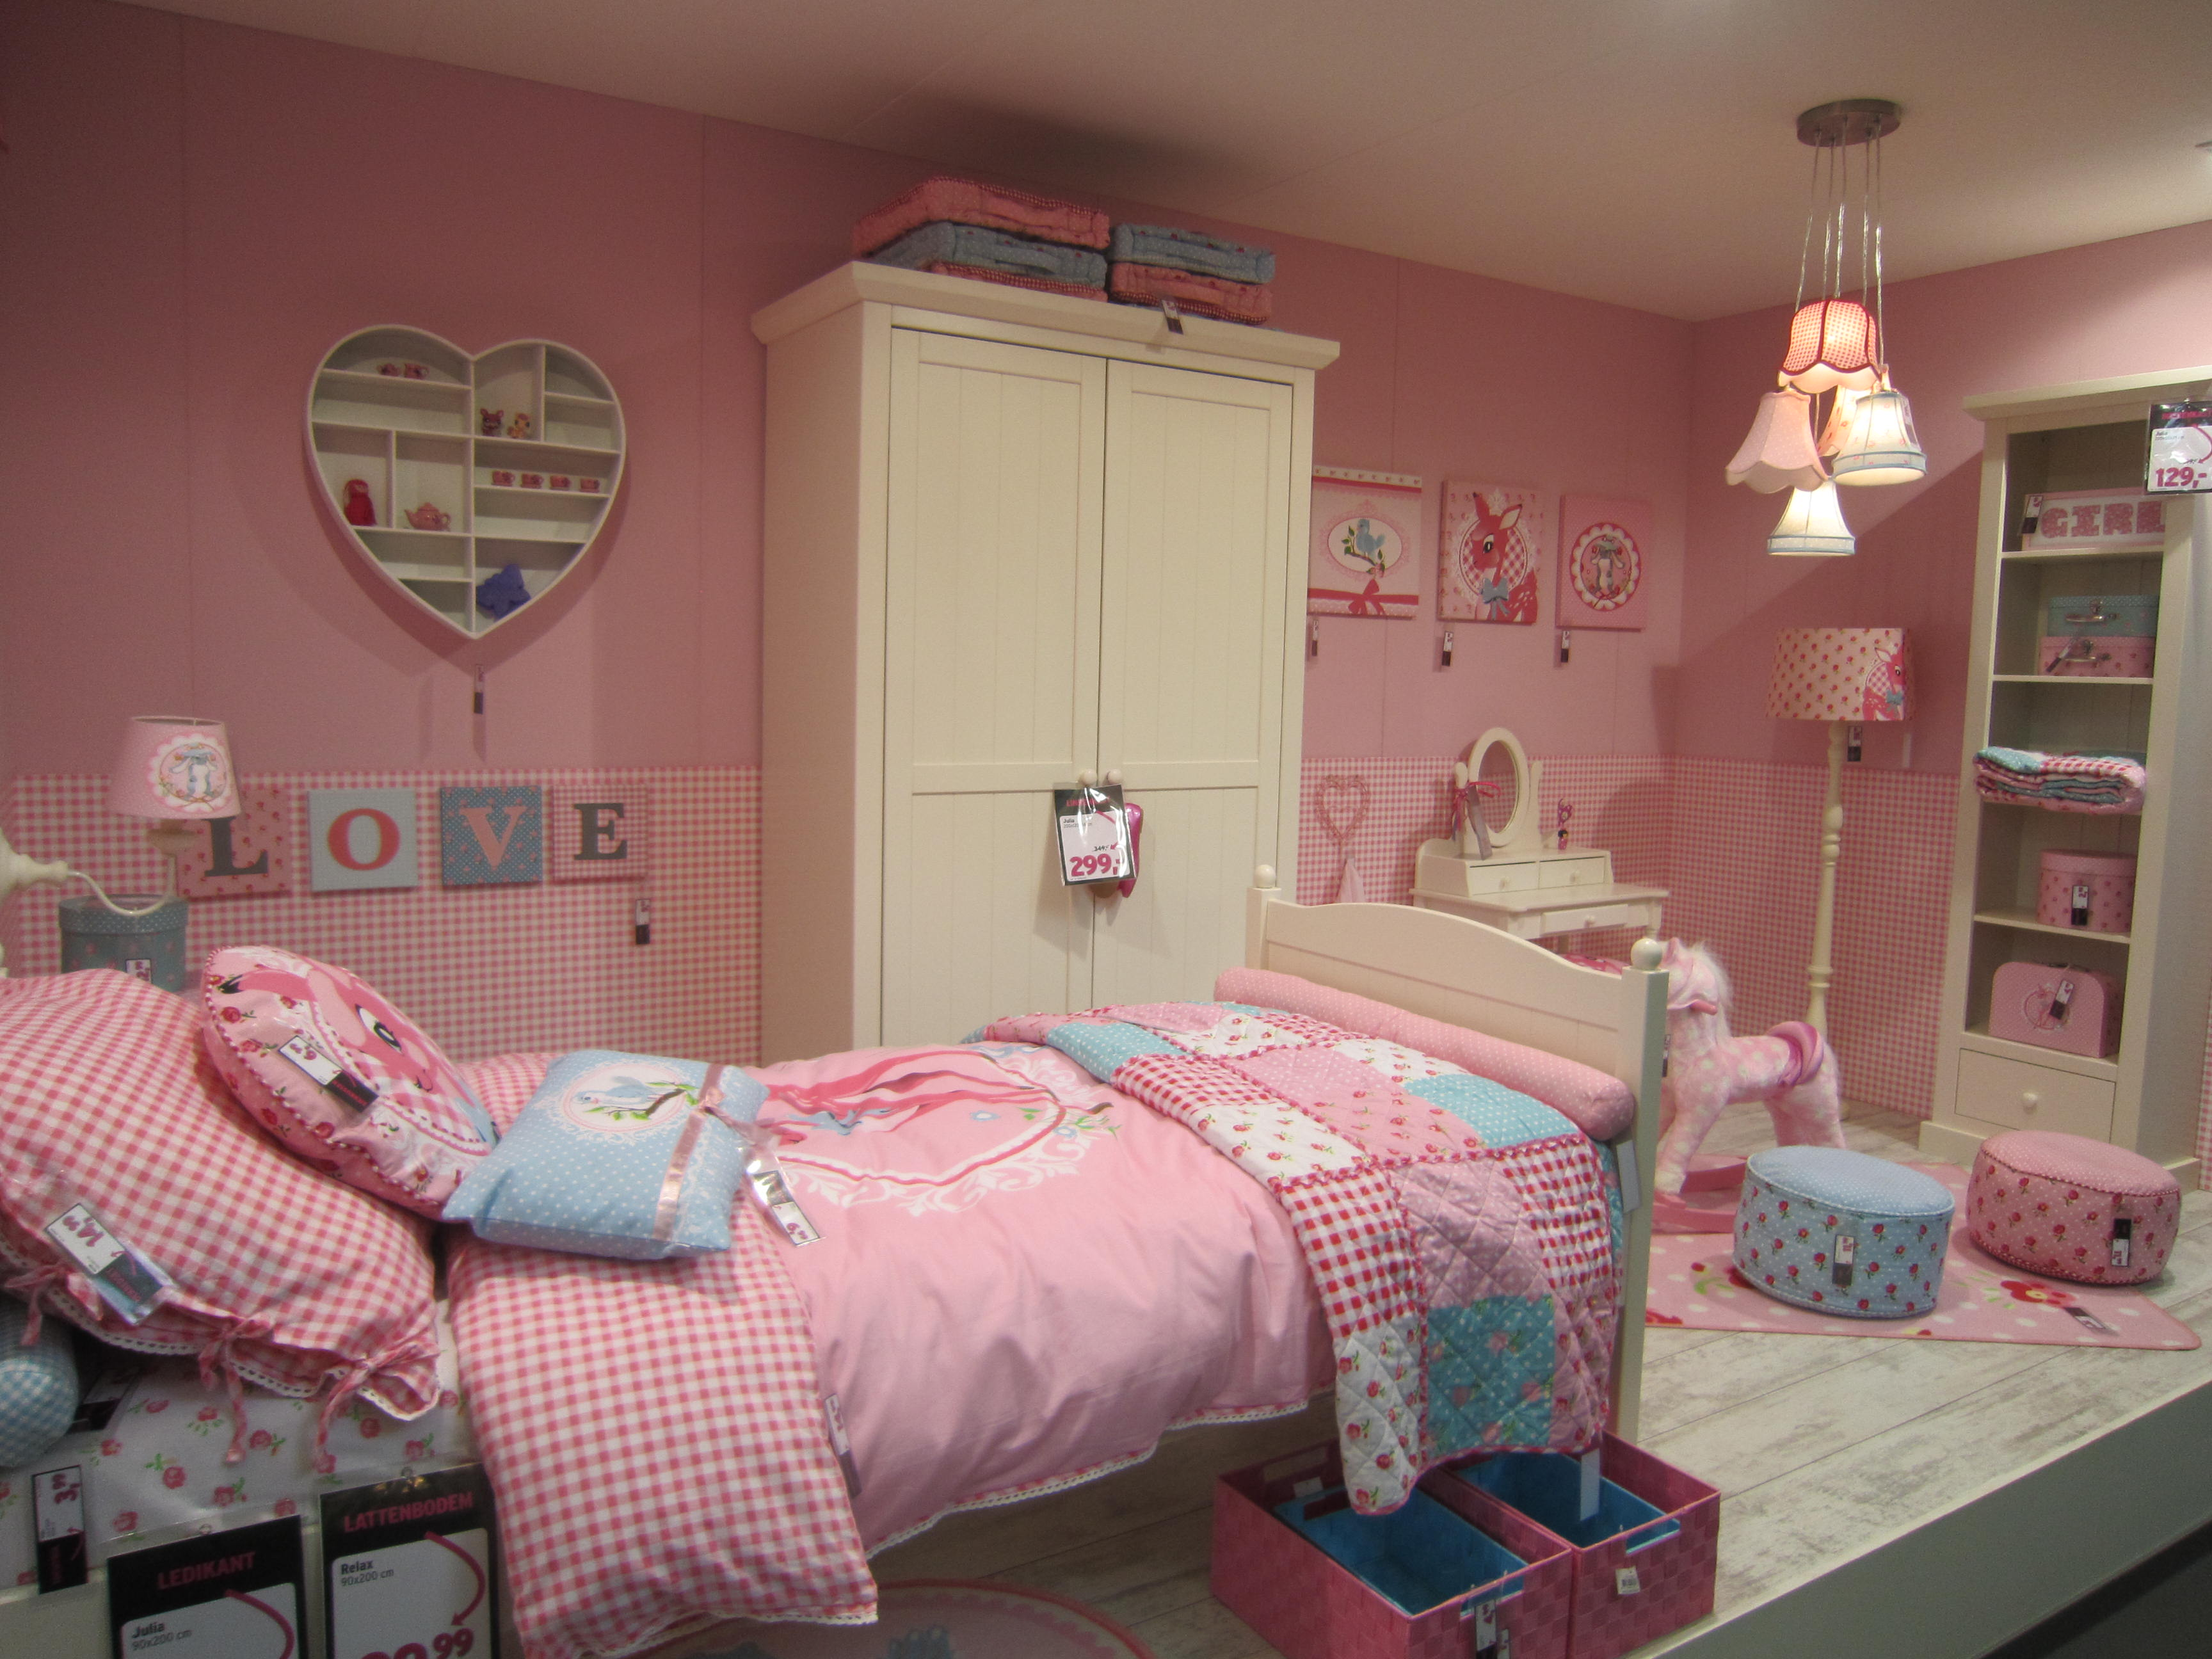 Decoratie – happy at home